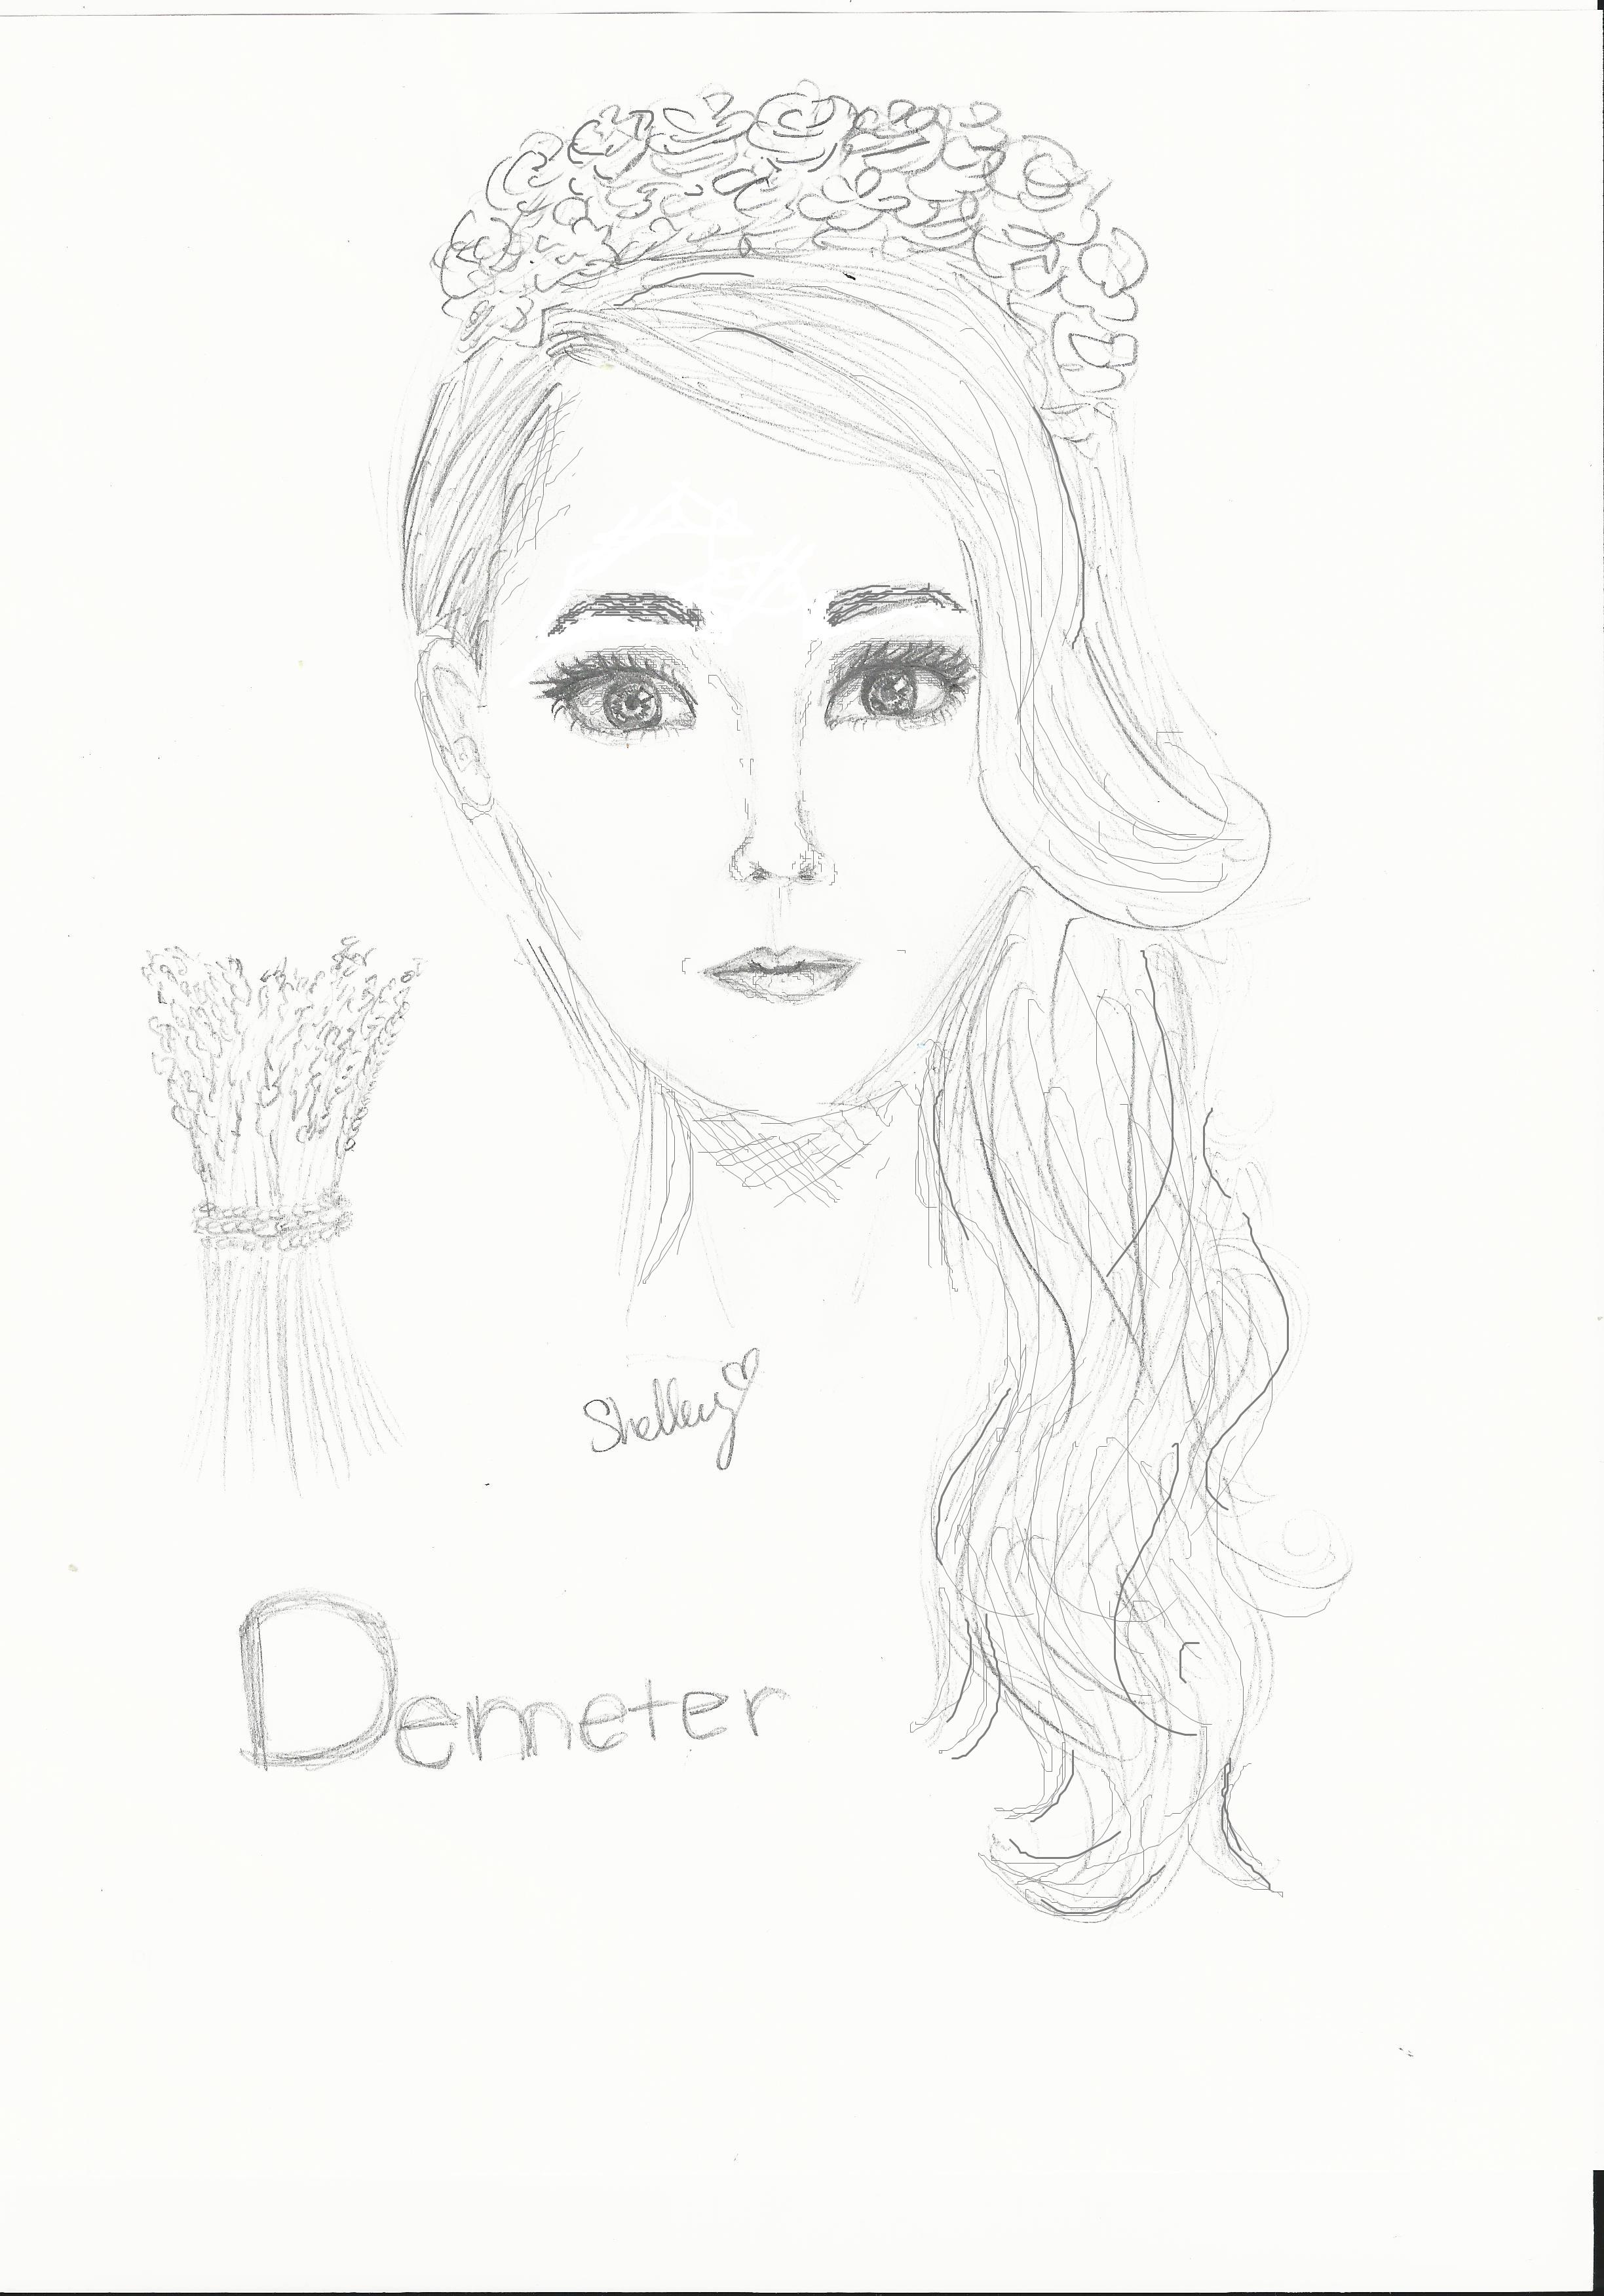 demeter greek goddess drawing - photo #11